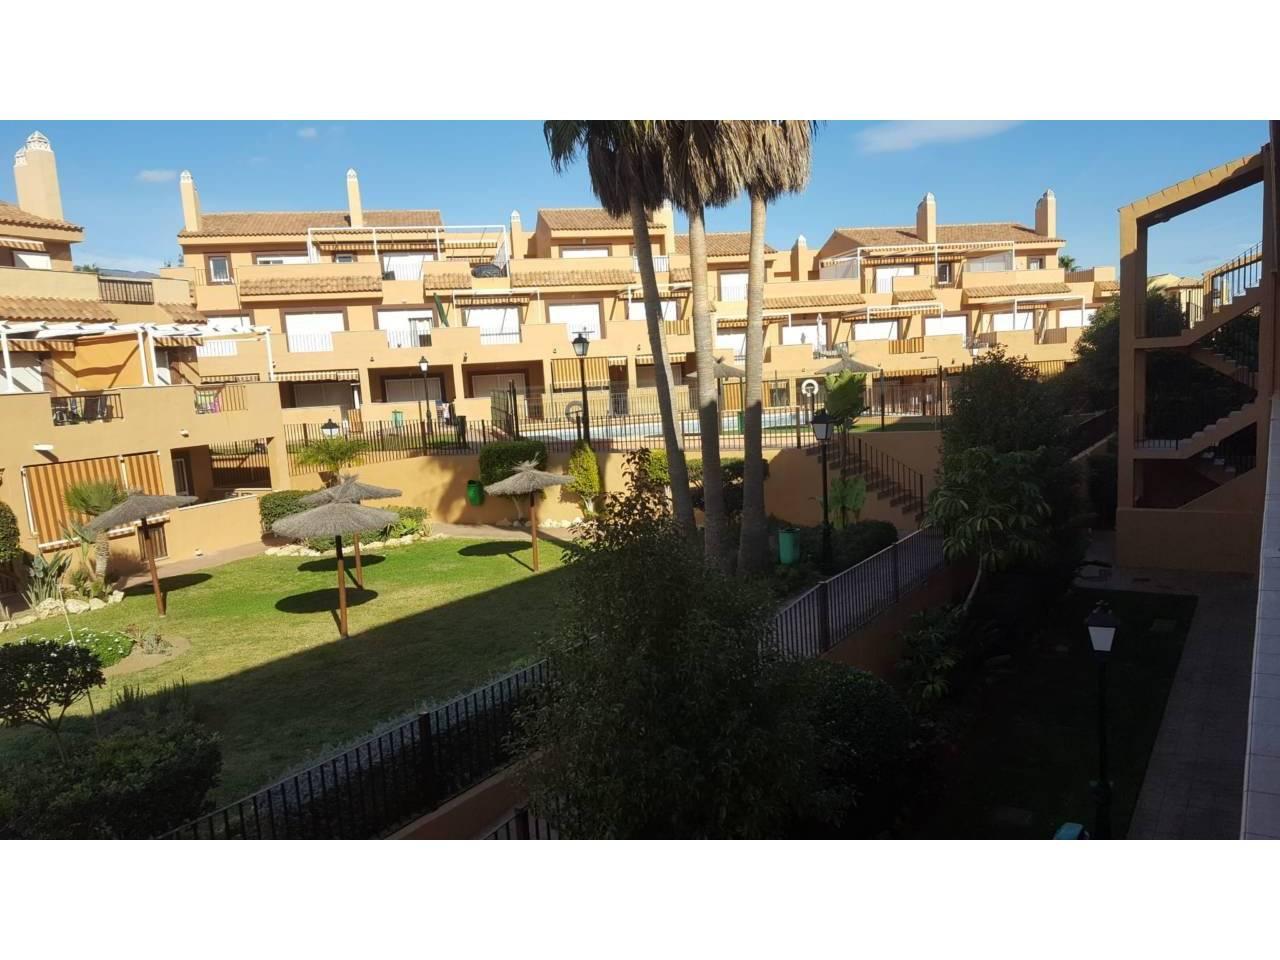 Apartamento en venta en Casares en Marina Casares, Calle: marina de casares